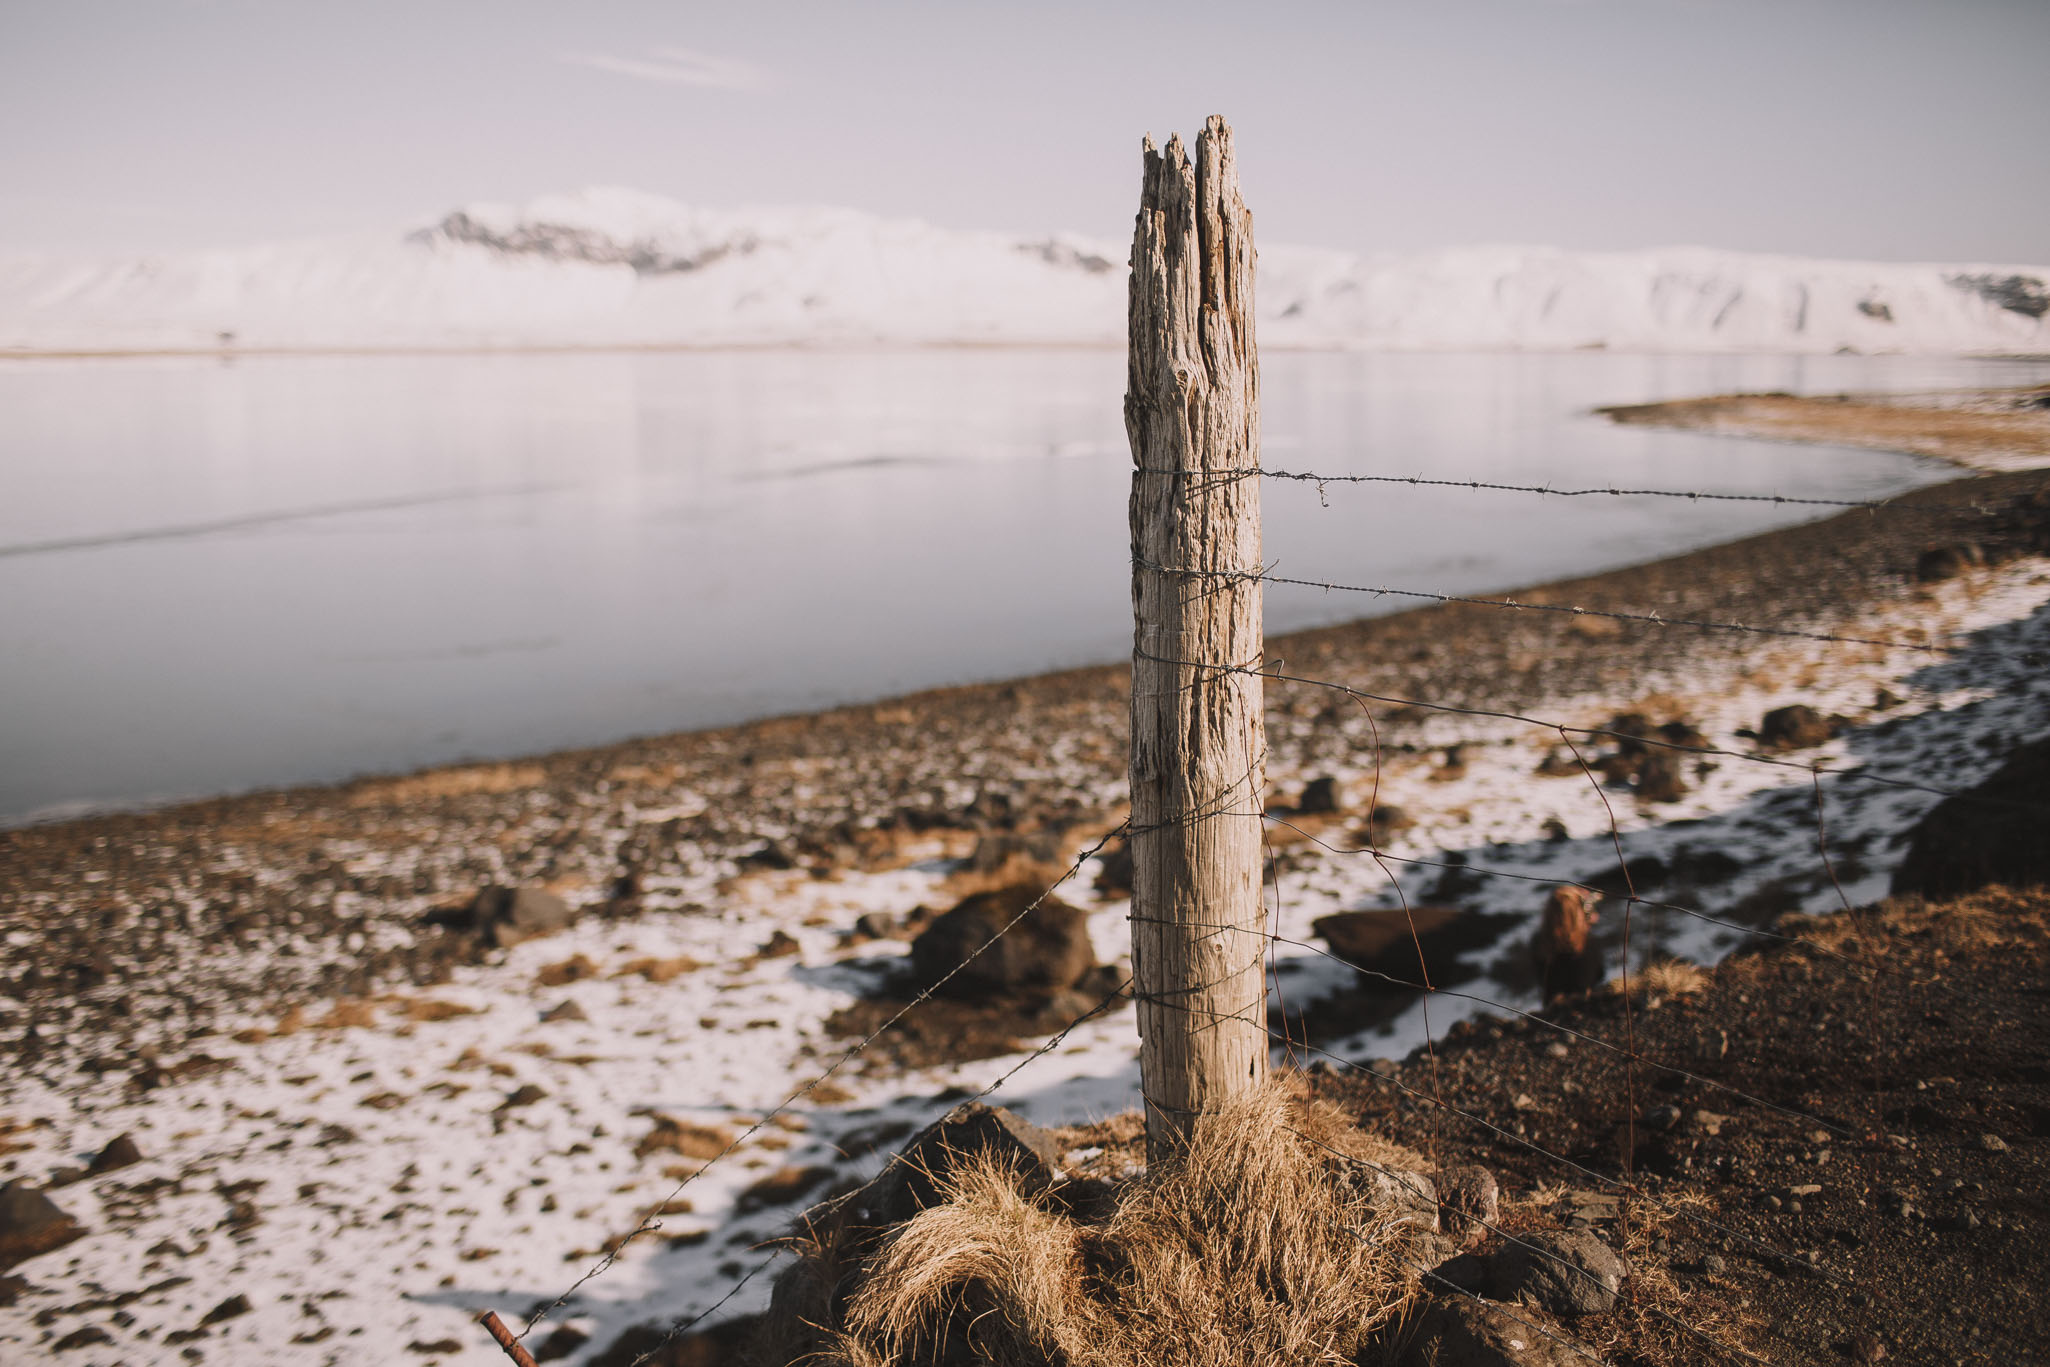 Road-trip-Islande-Iceland-Voyage-Travel-Portrait-Jérémy-Boyer-Sunny-day-between-Skogafoss-Dyrholaey-2.jpg